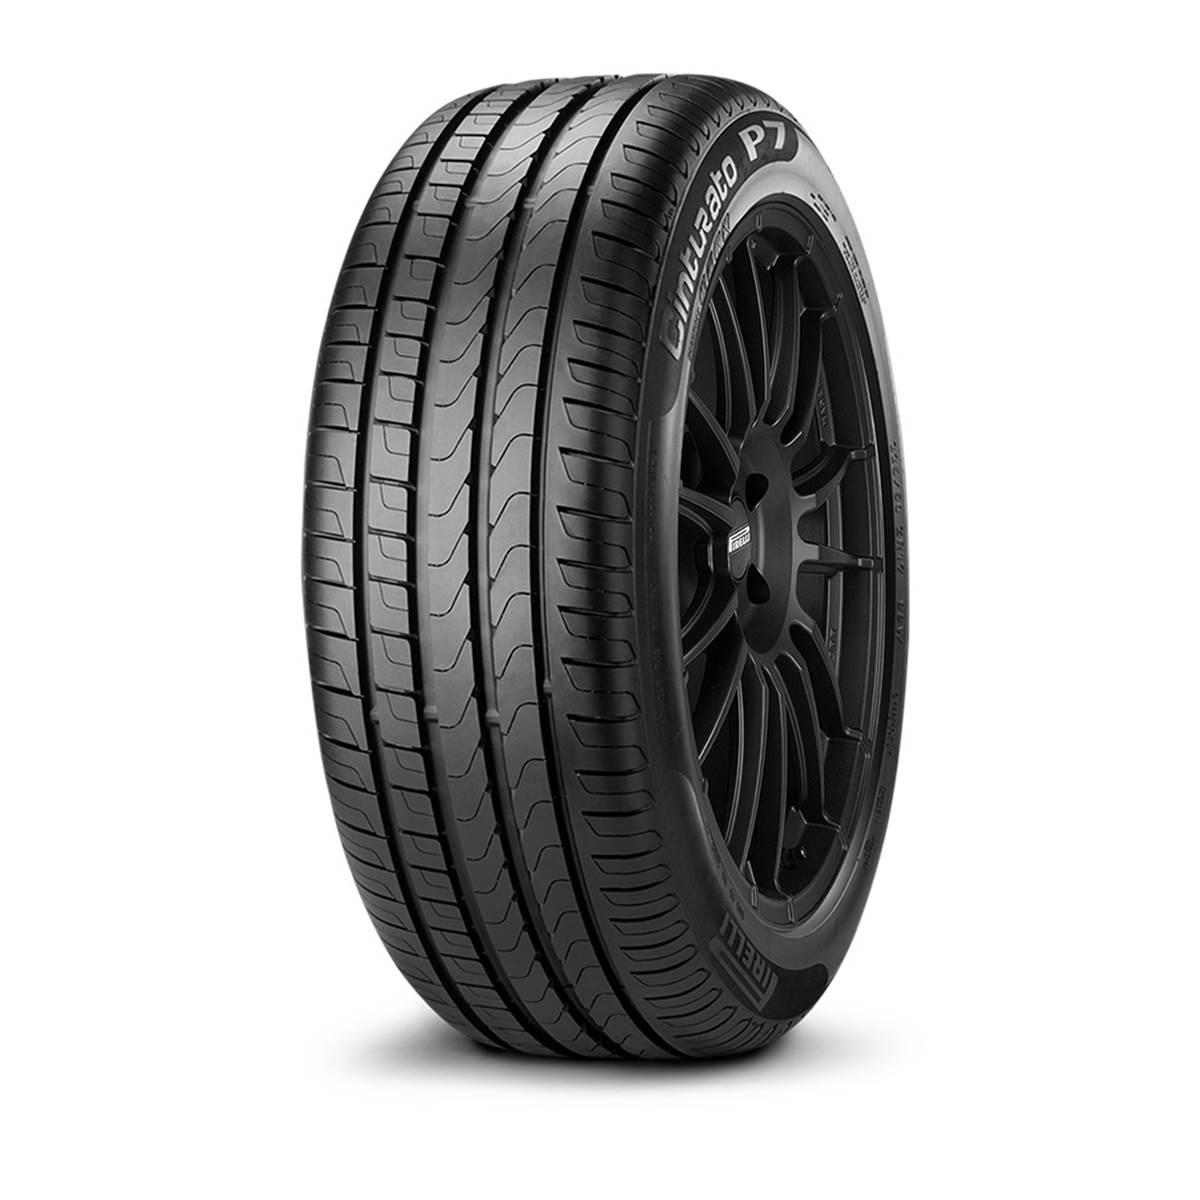 Pirelli Cinturato P7 Homologue Bmw